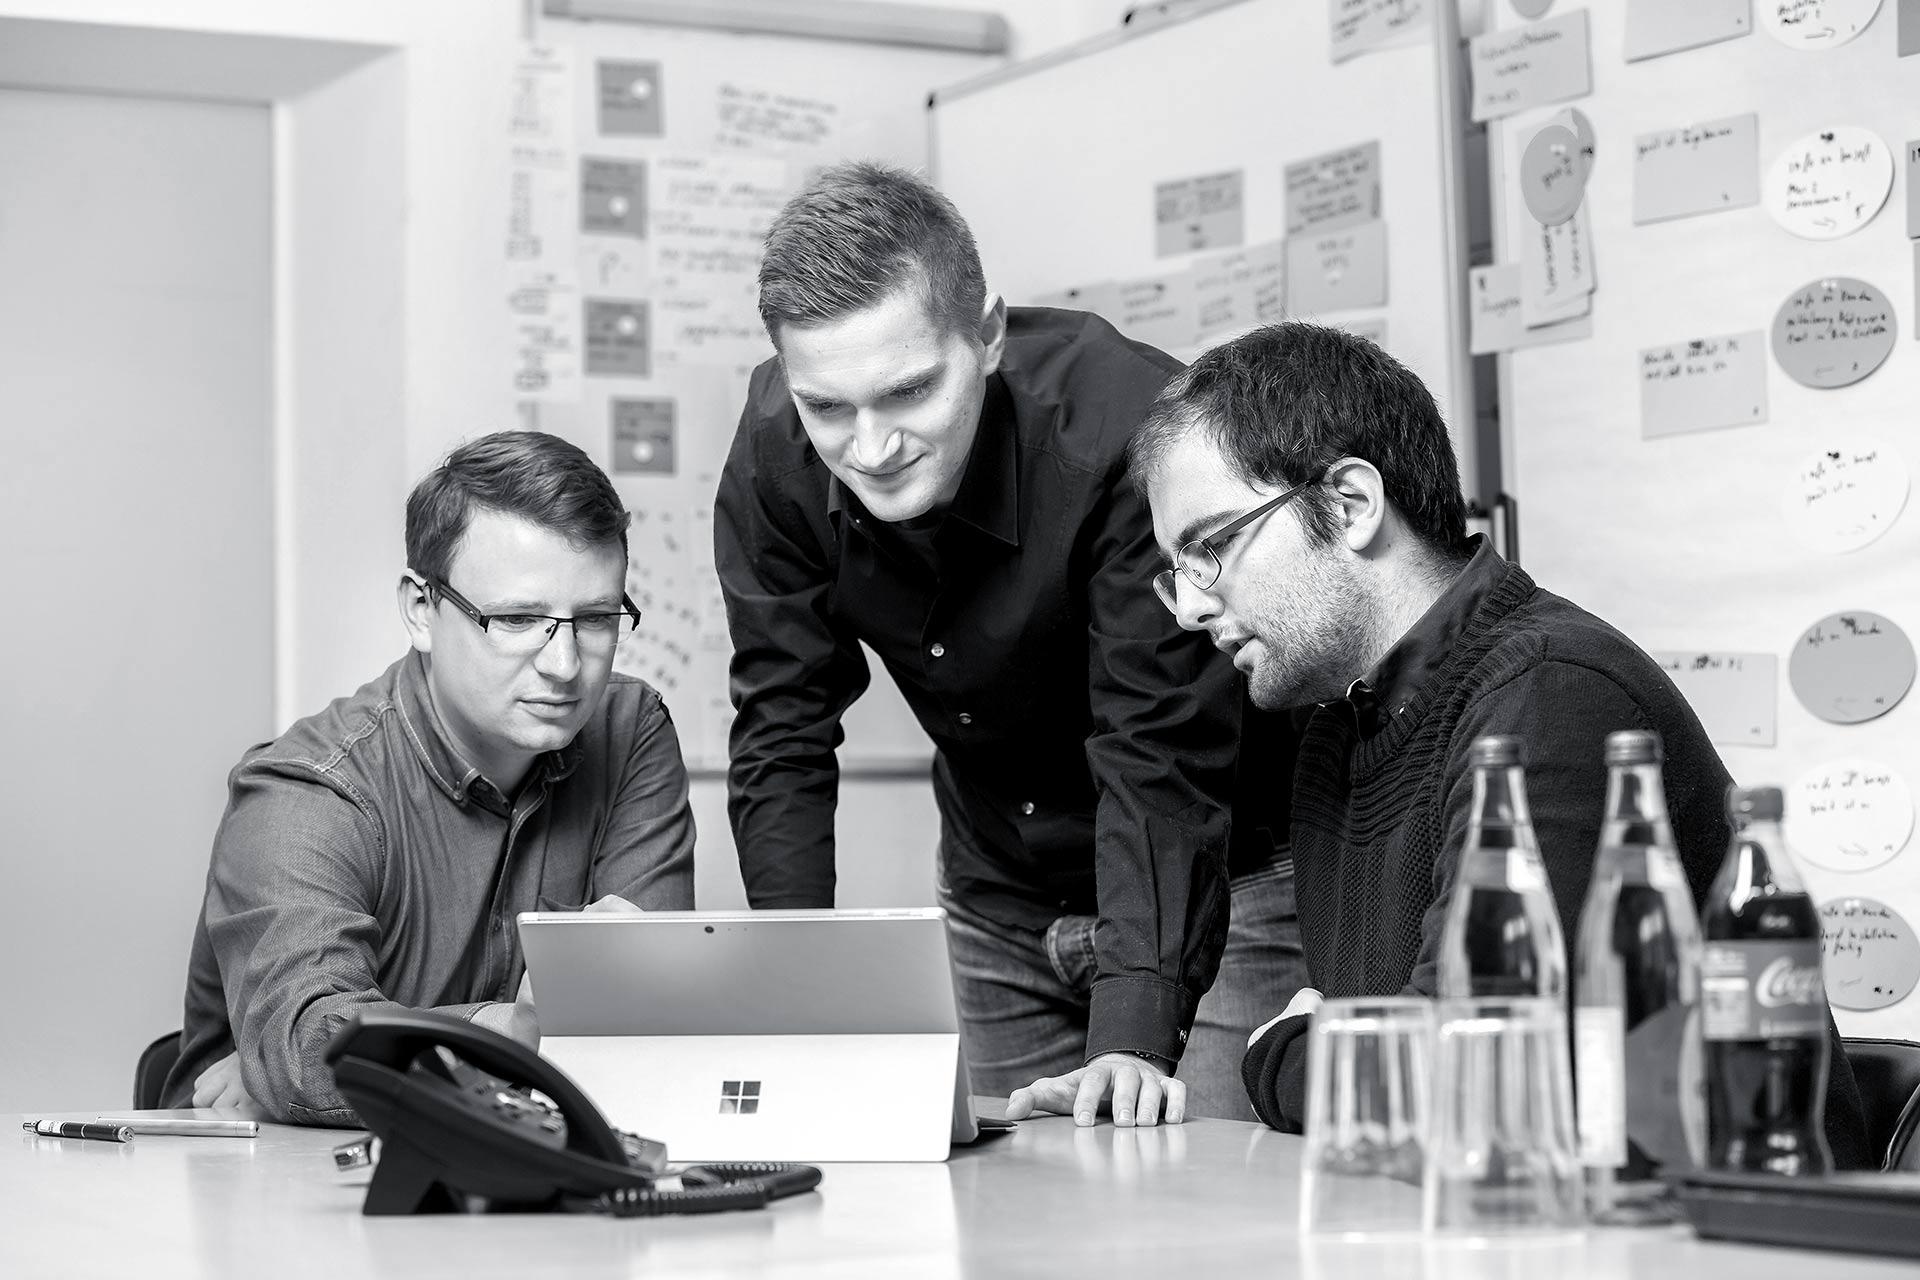 teamfoto-unternehmen-arbeitssituation